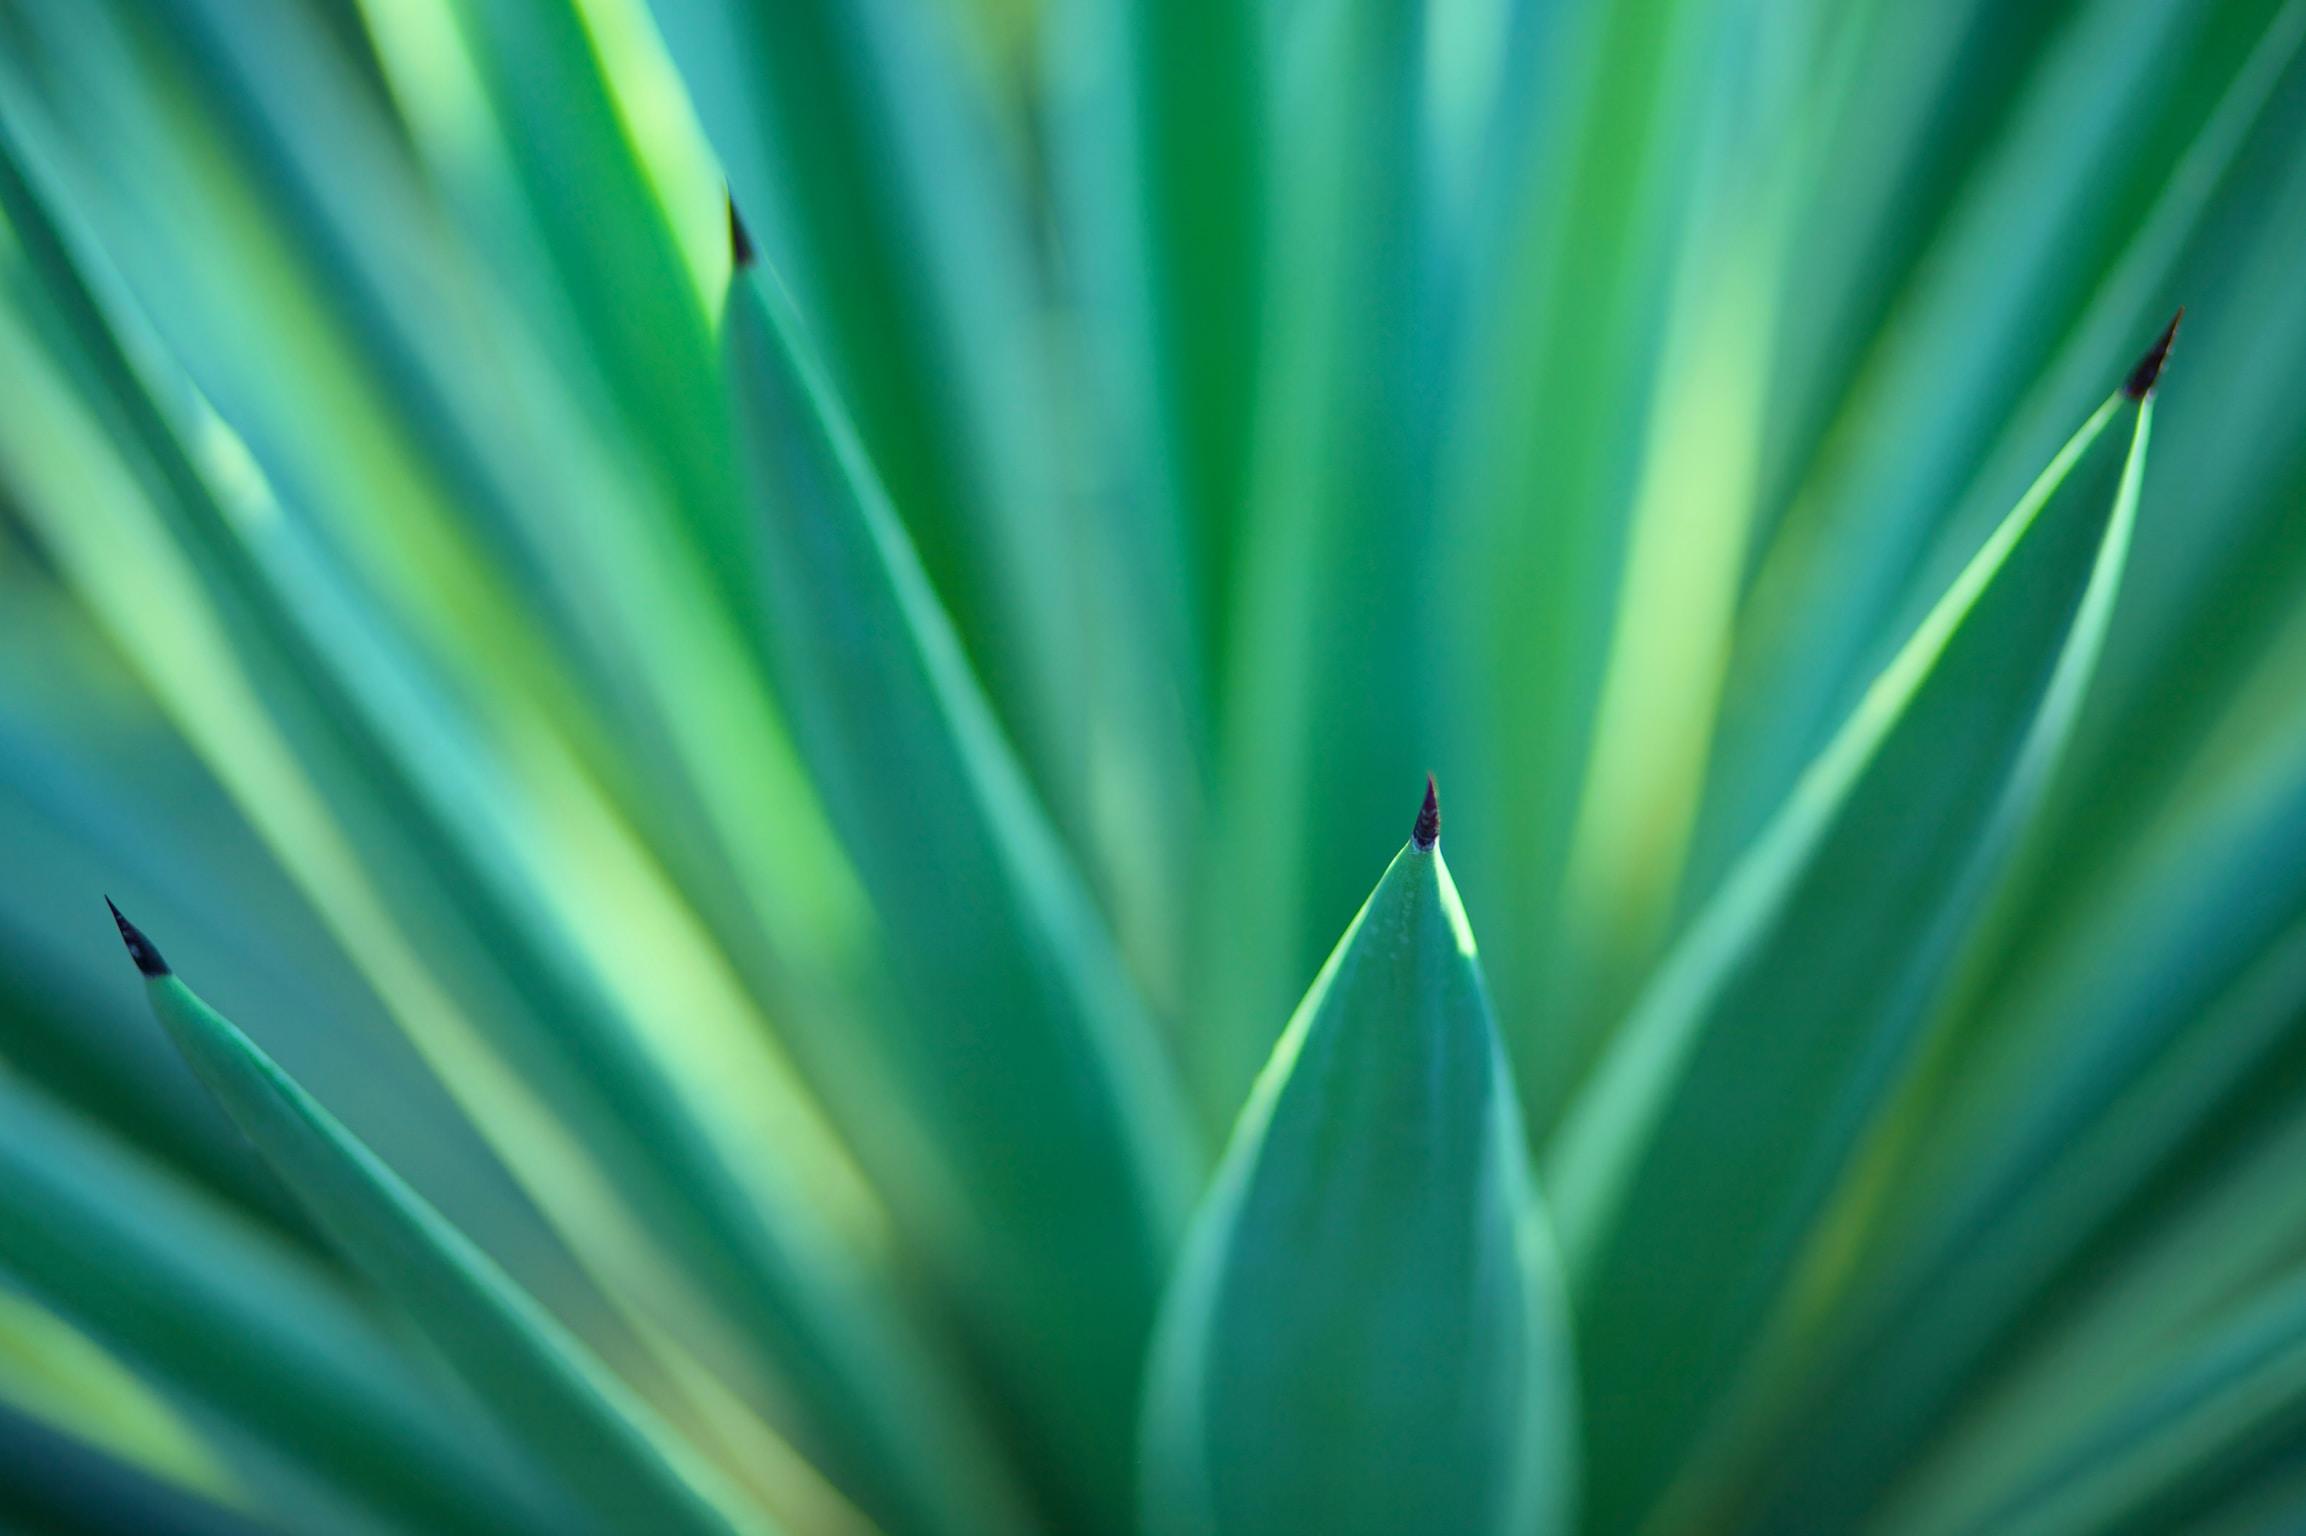 A macro shot of sharp green flax leaves shooting upwards